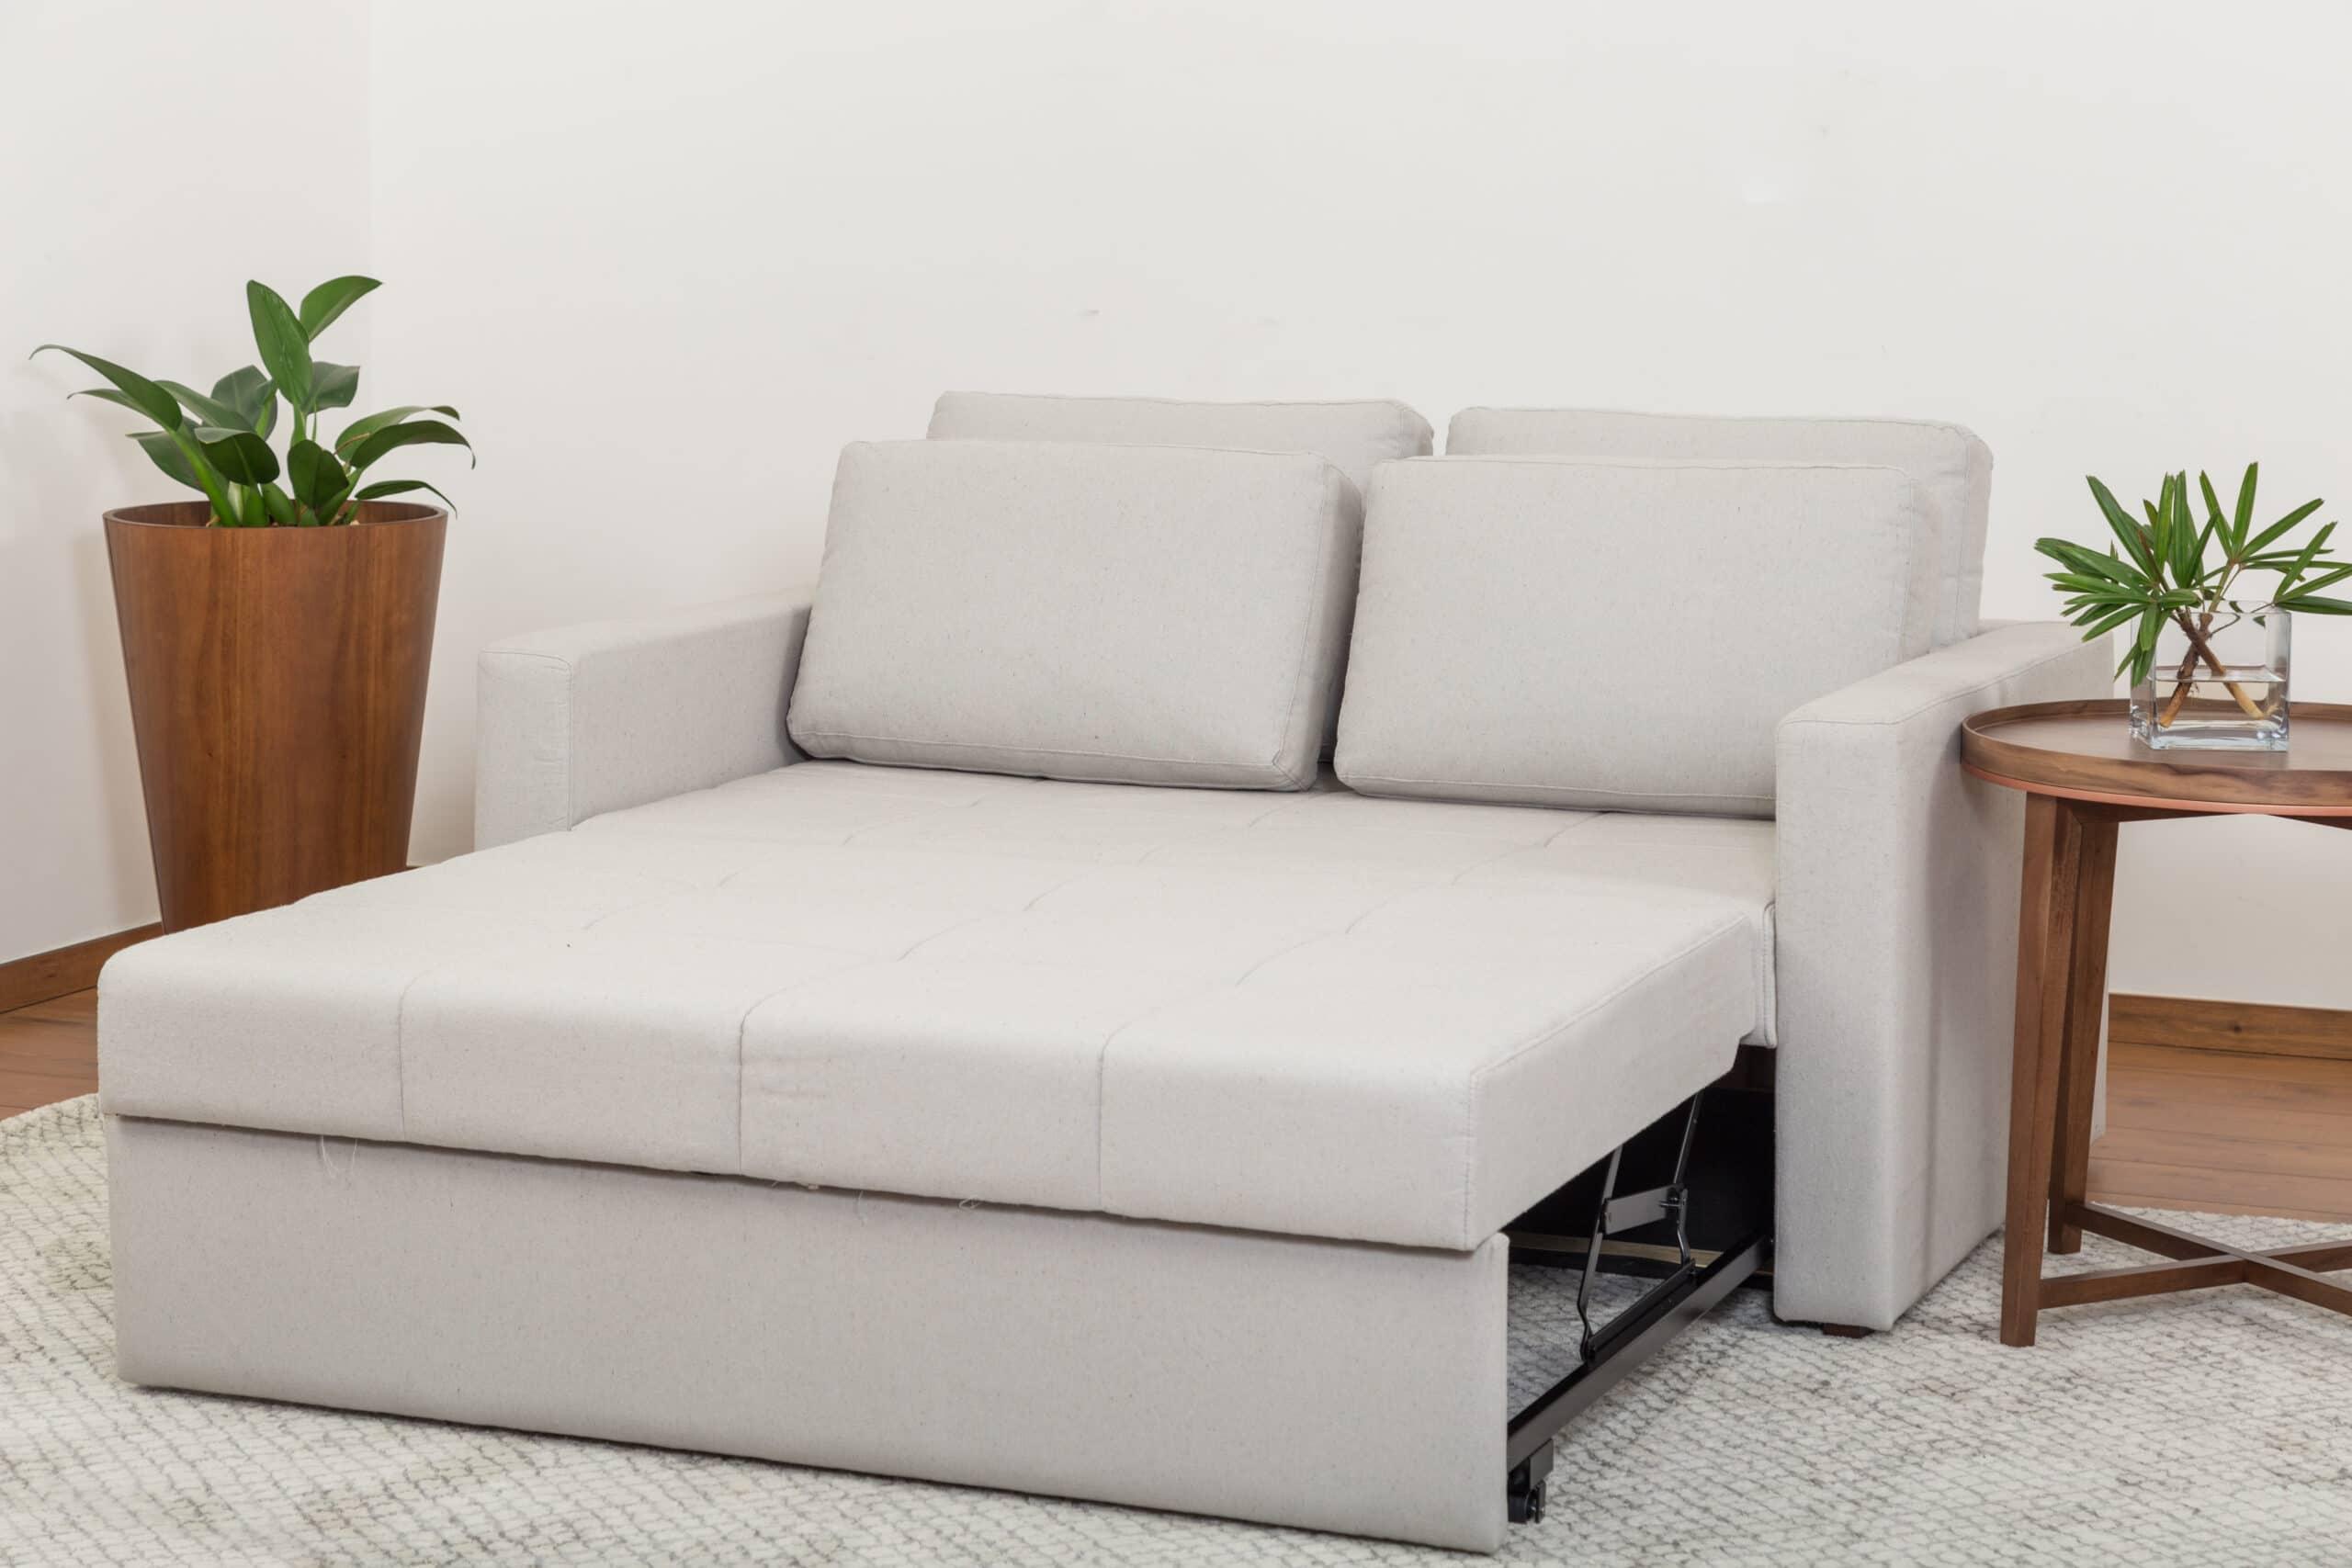 Sofa-cama-arbor3